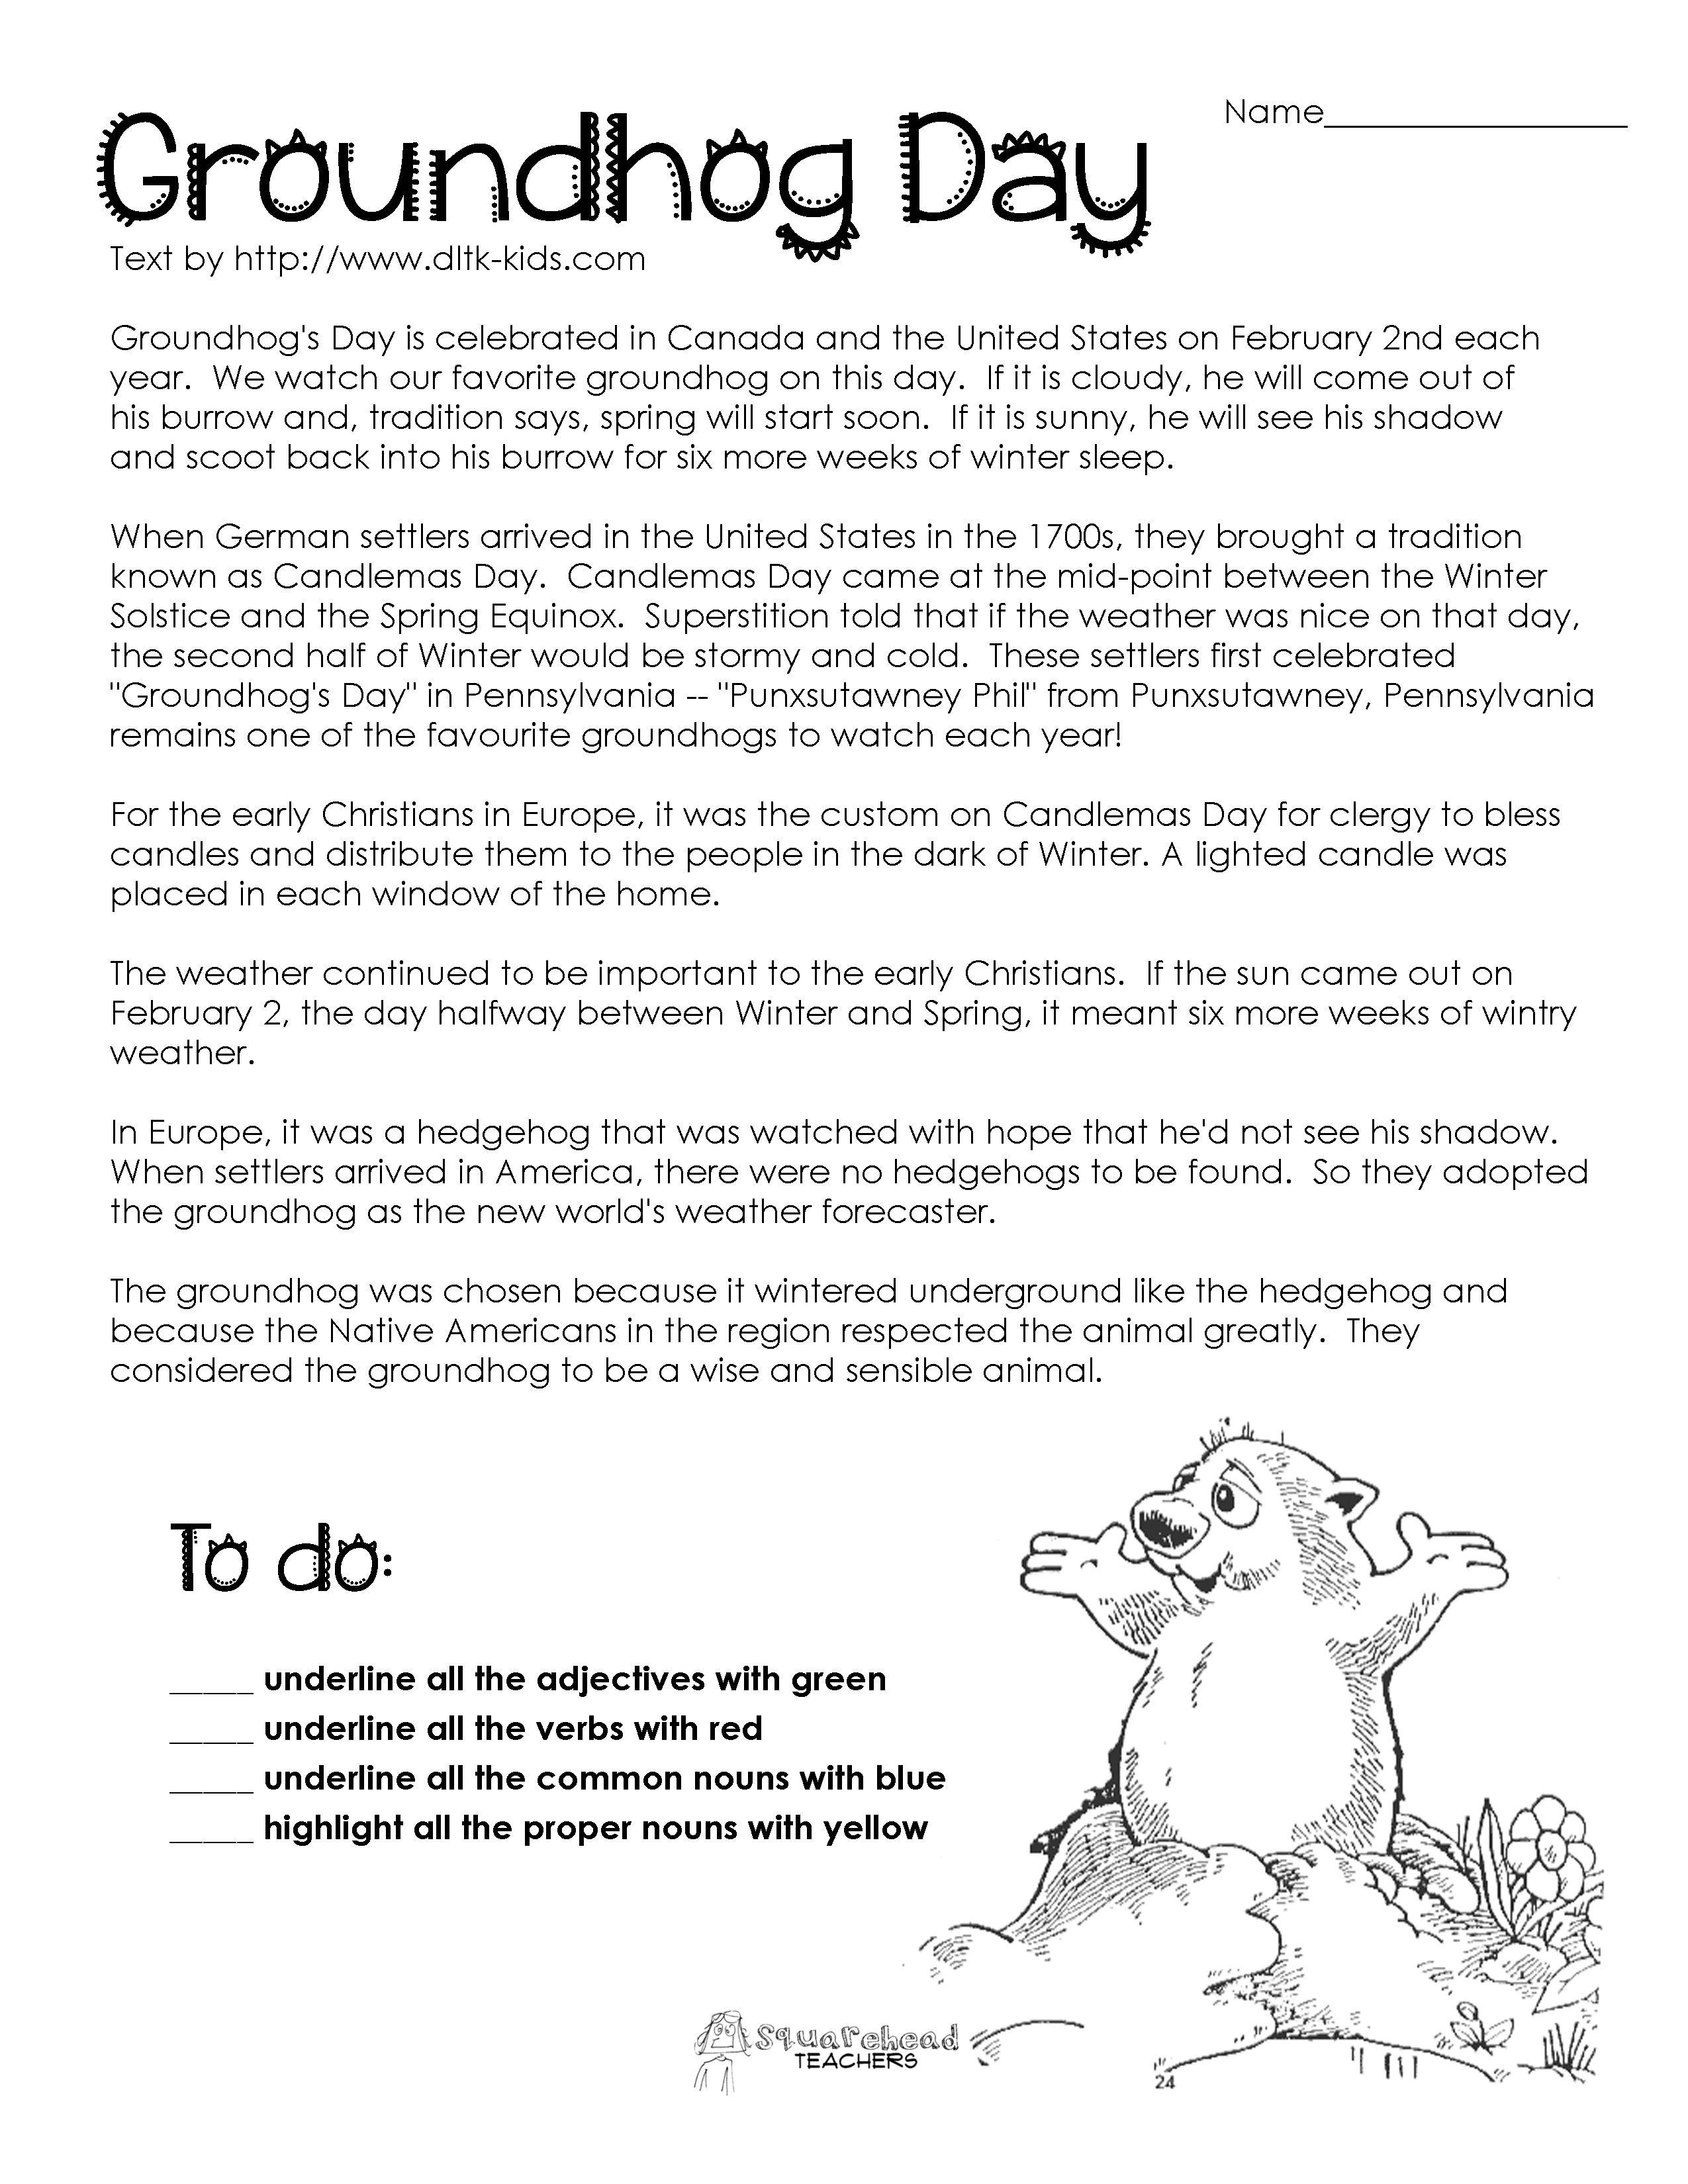 Groundhog Day Comprehension Worksheets - Google Search | Ground Hog - Free Printable Groundhog Day Reading Comprehension Worksheets